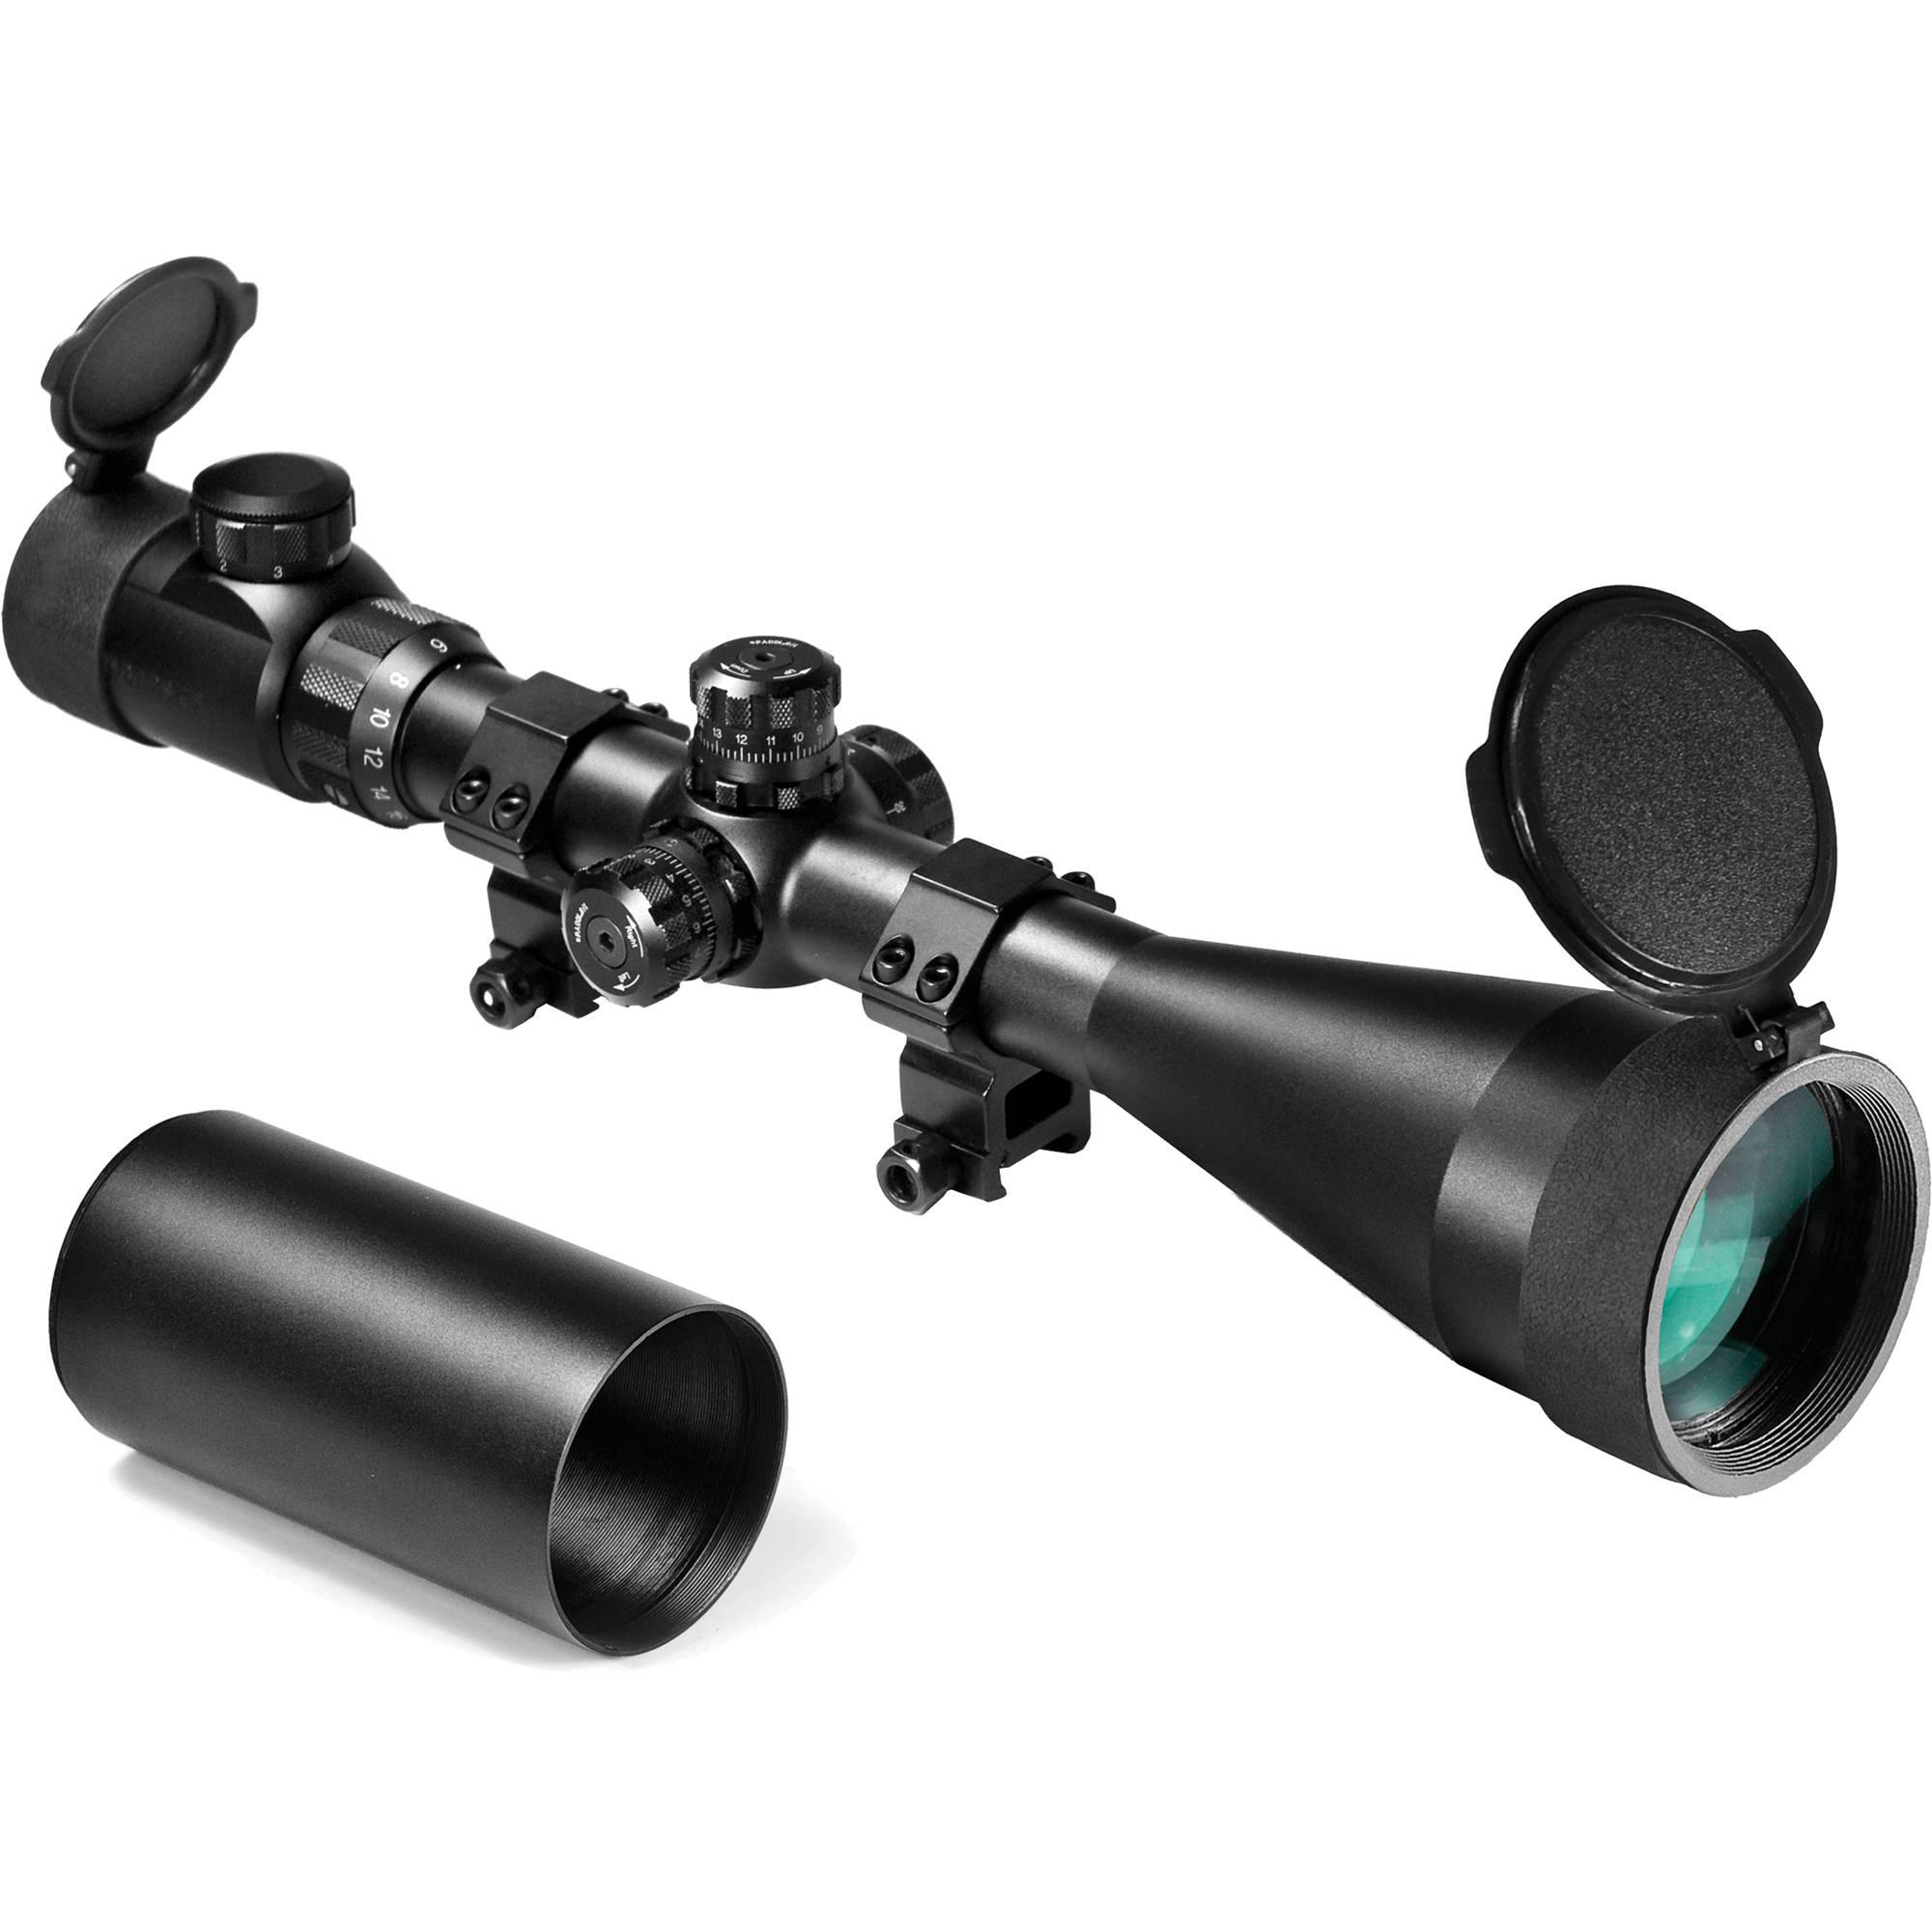 Riflescope-BARSKA-SWAT-6-24X60-IR